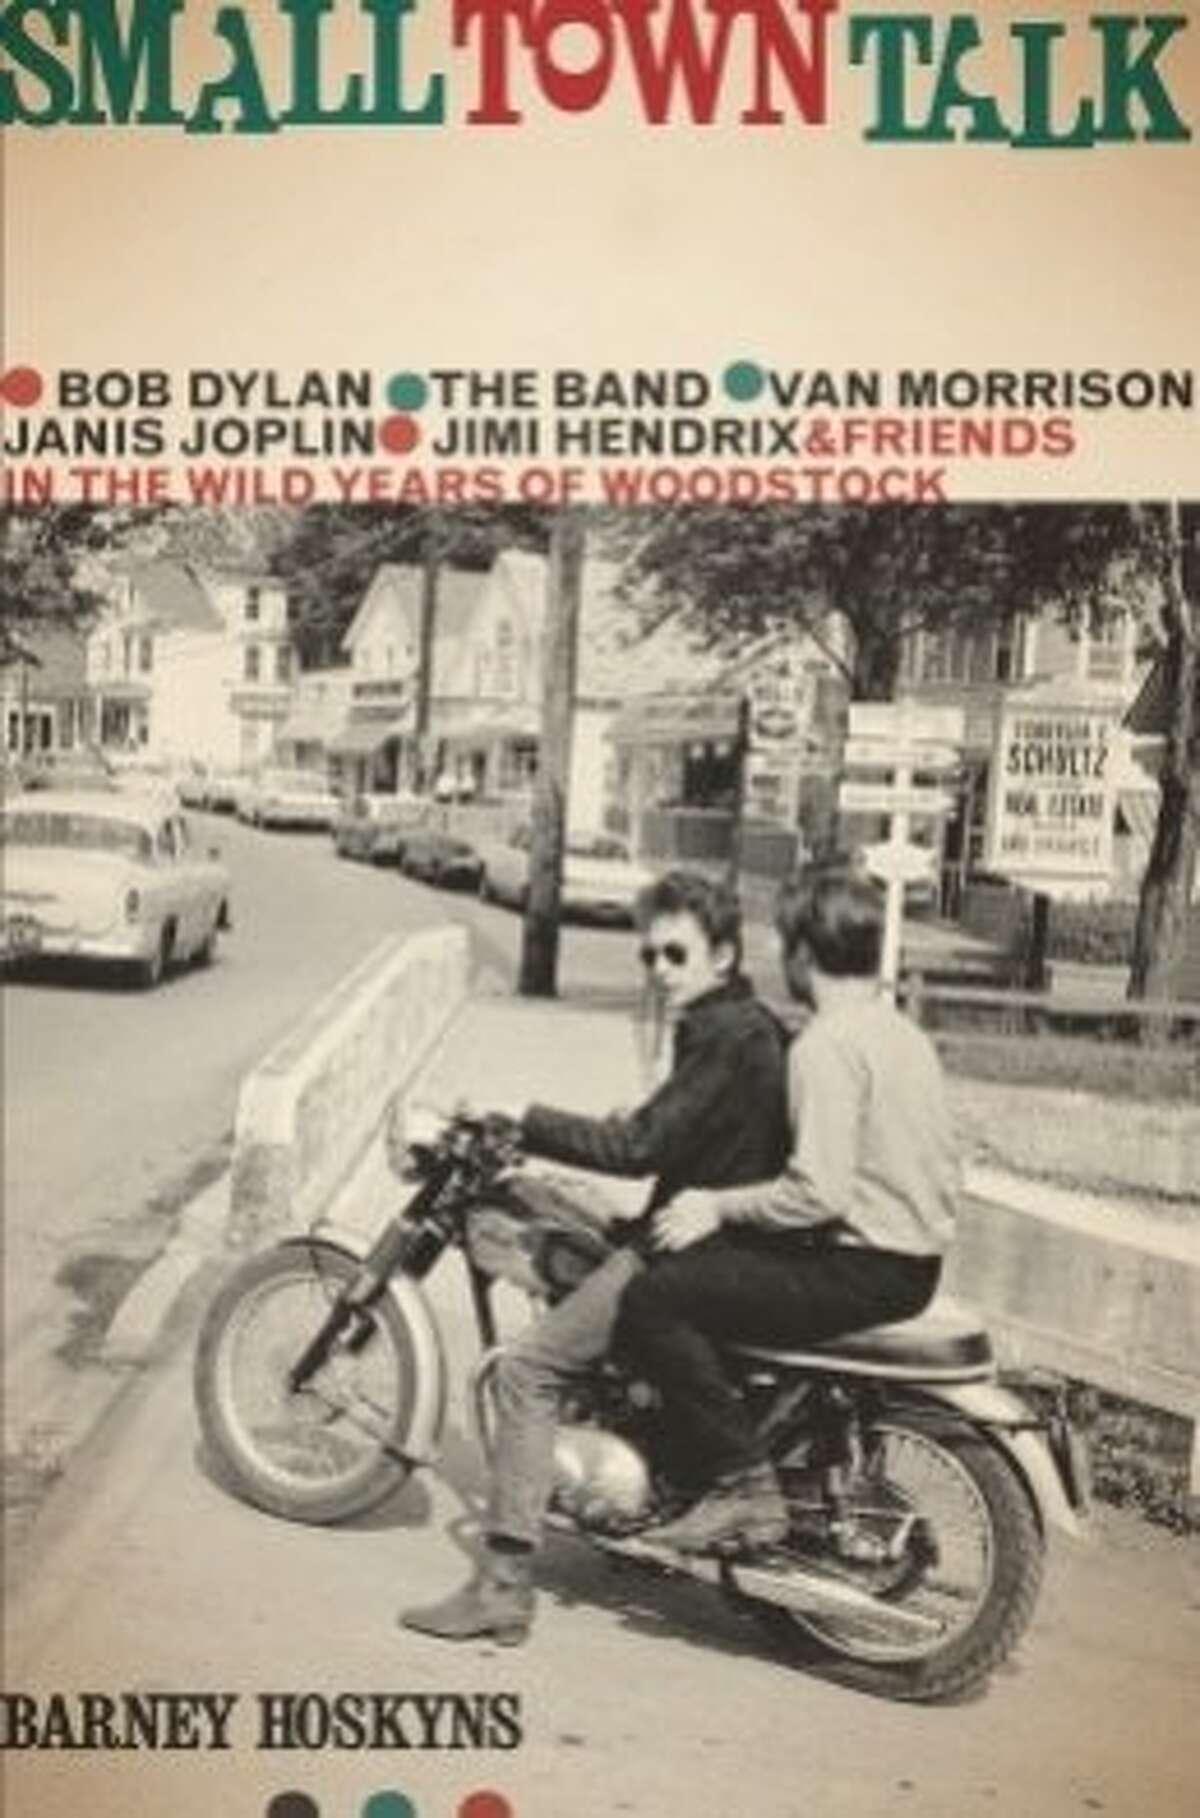 Book cover: �Small Town Talk: Bob Dylan, The Band, Van Morrison, Janis Joplin, Jimi Hendrix & Friends in the Wild Years of Woodstock�